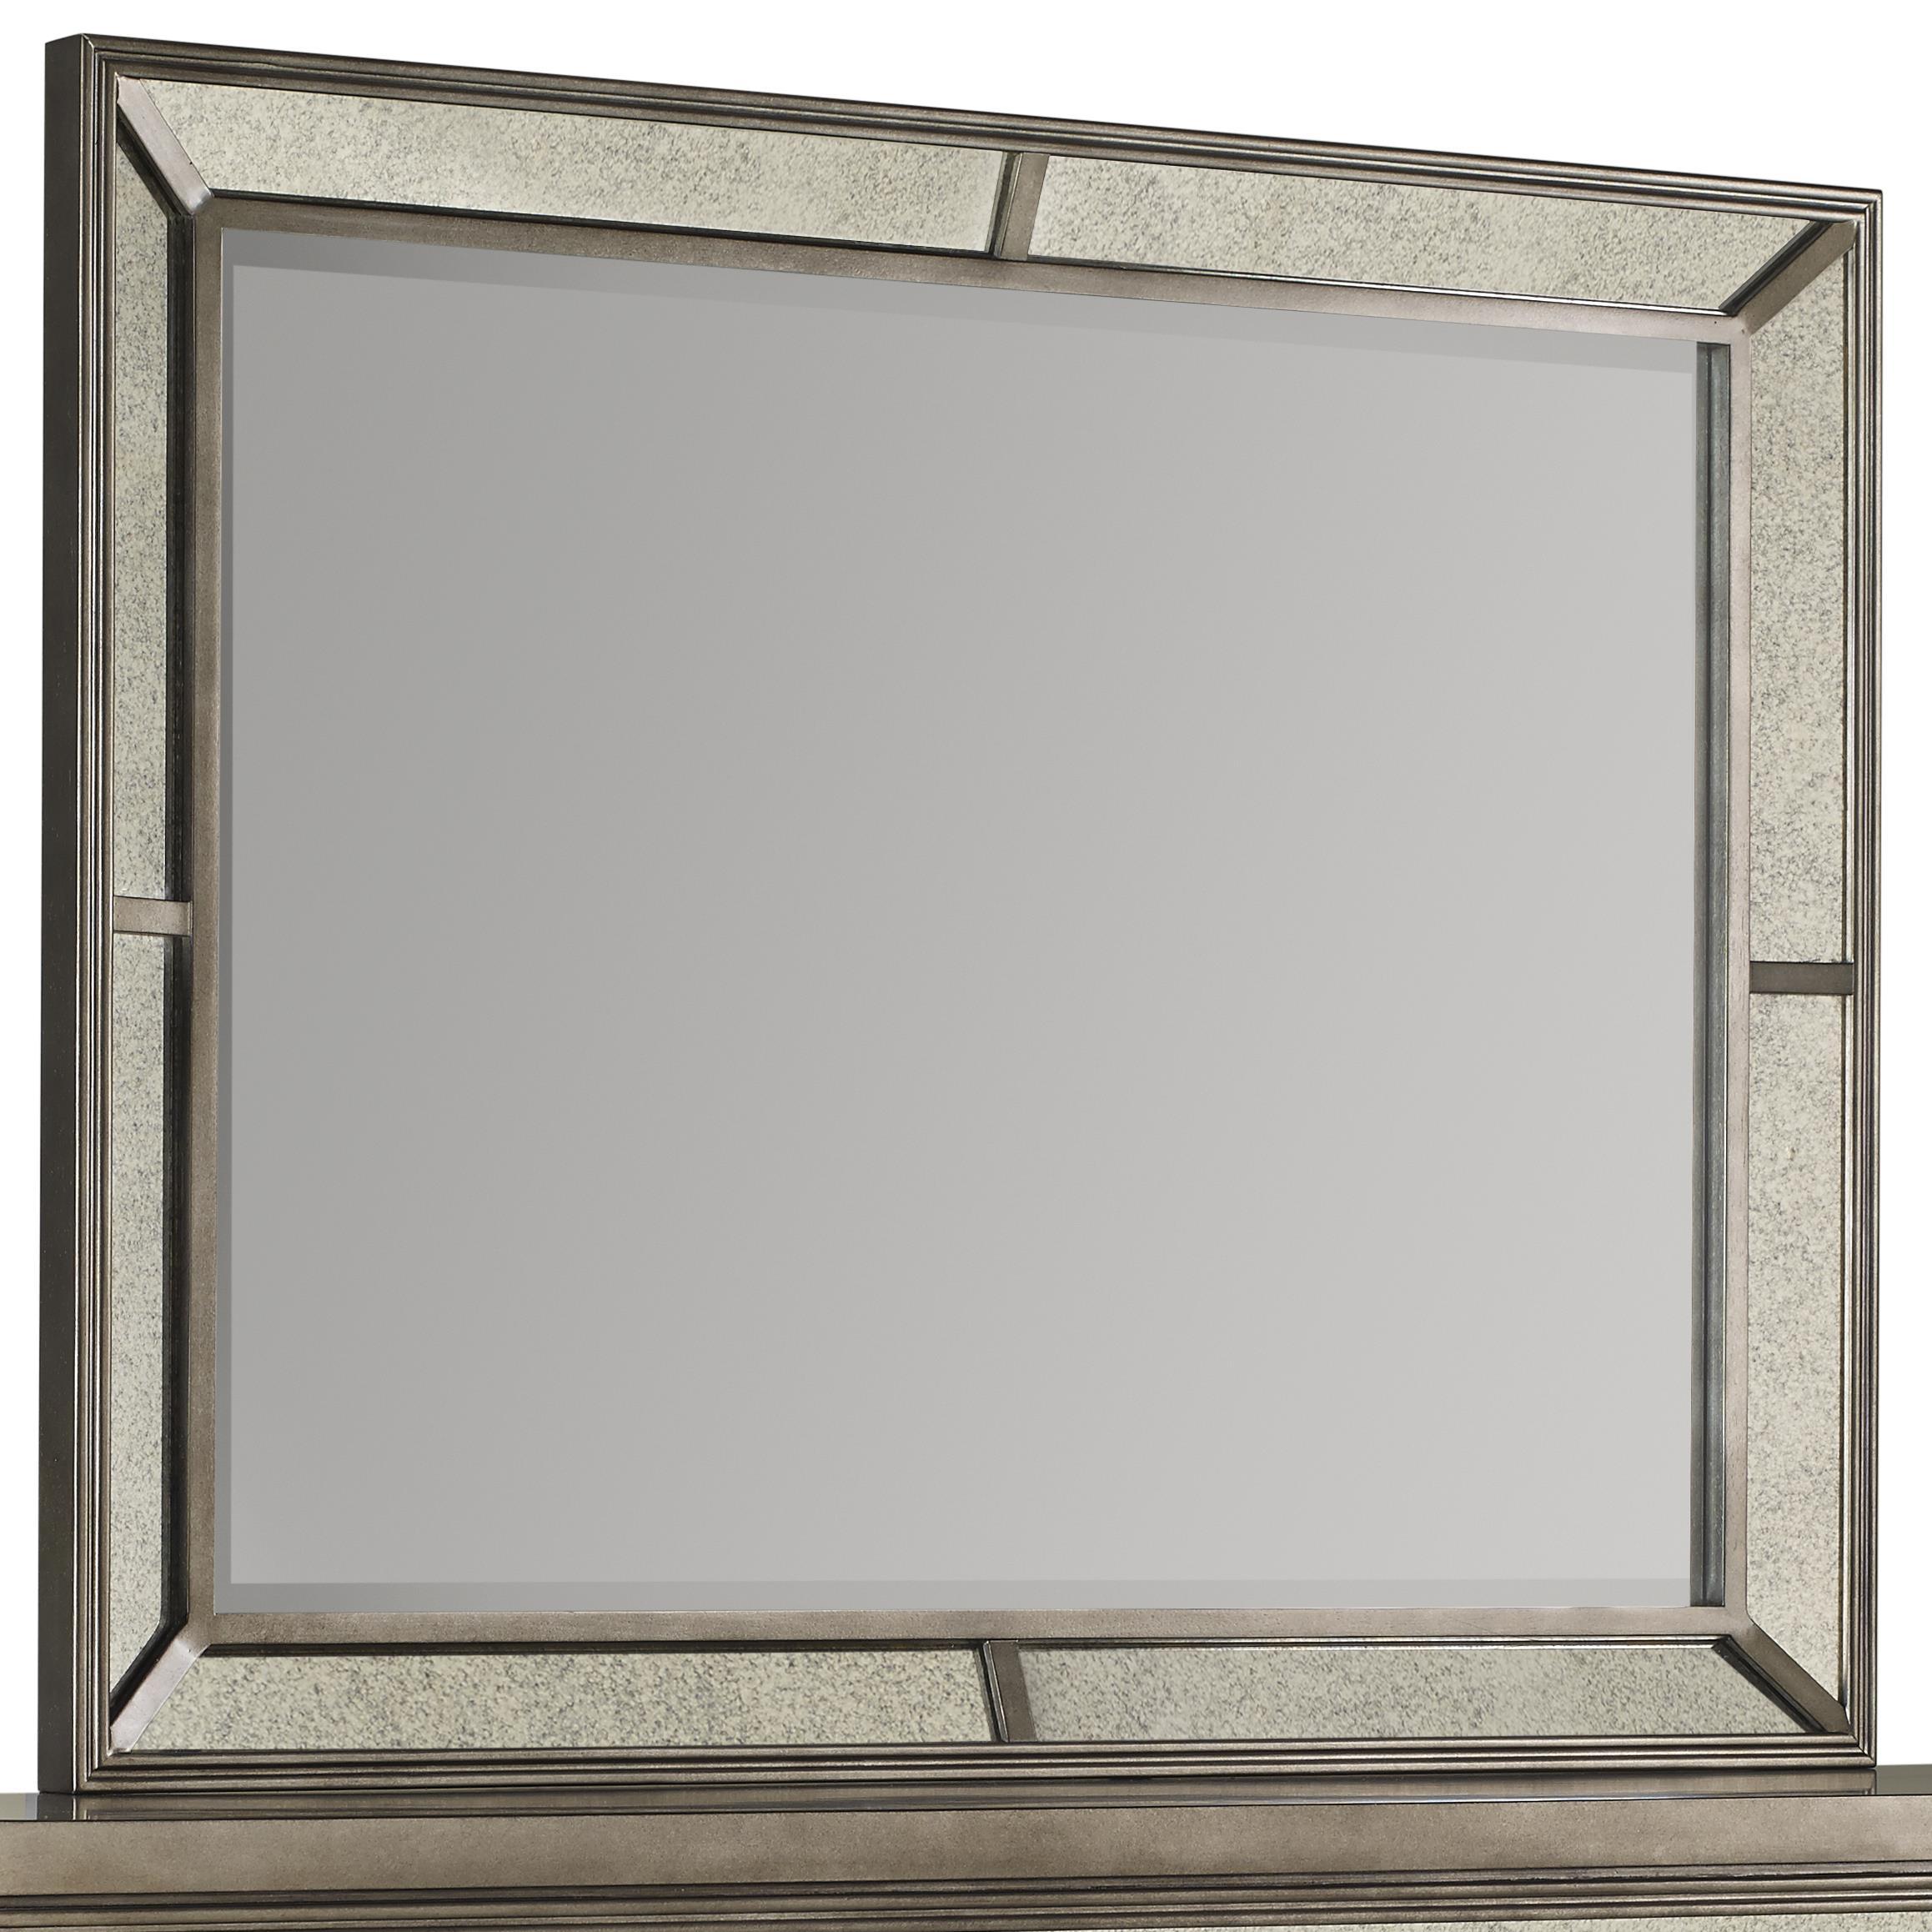 Avalon Furniture Lenox Beveled Glass Mirror